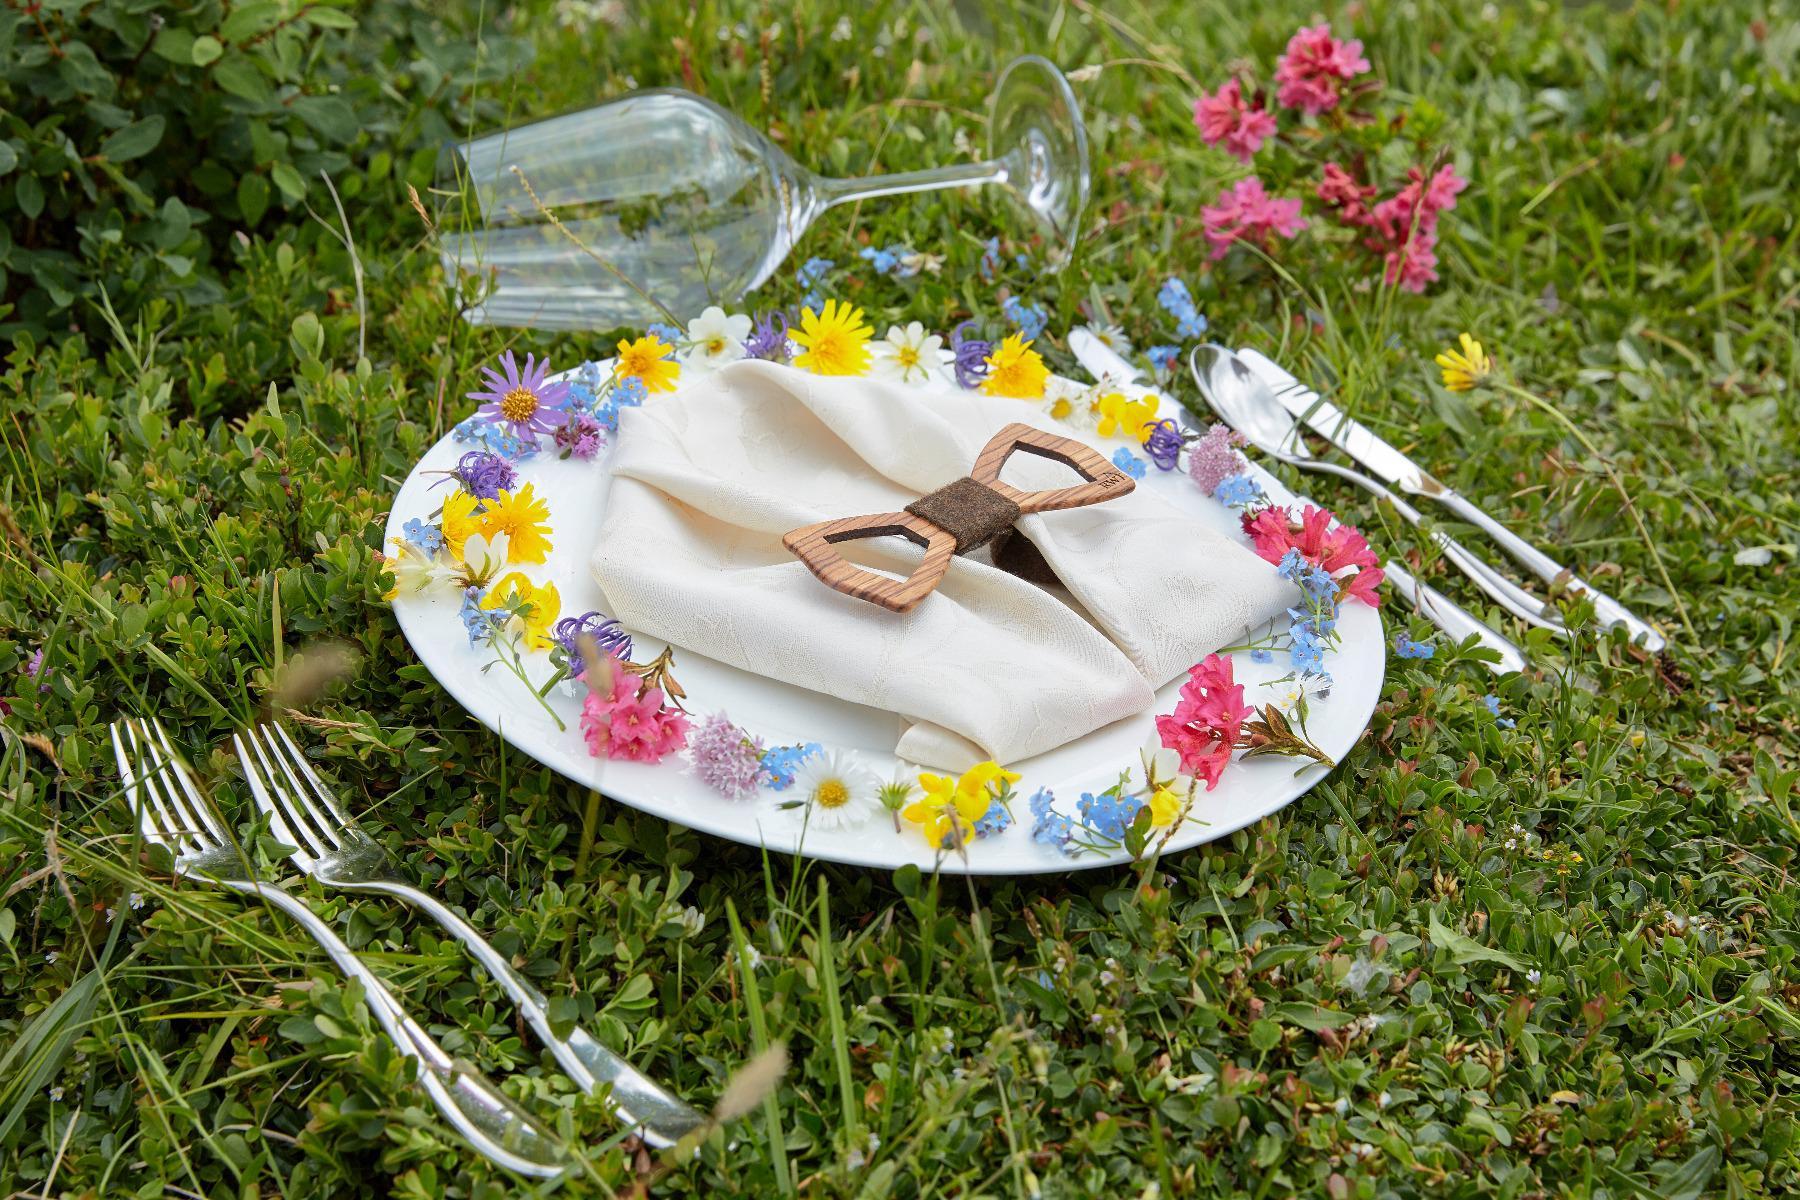 Picknick im Naturpark Fanes-Senes-Prags Wochenprogramm